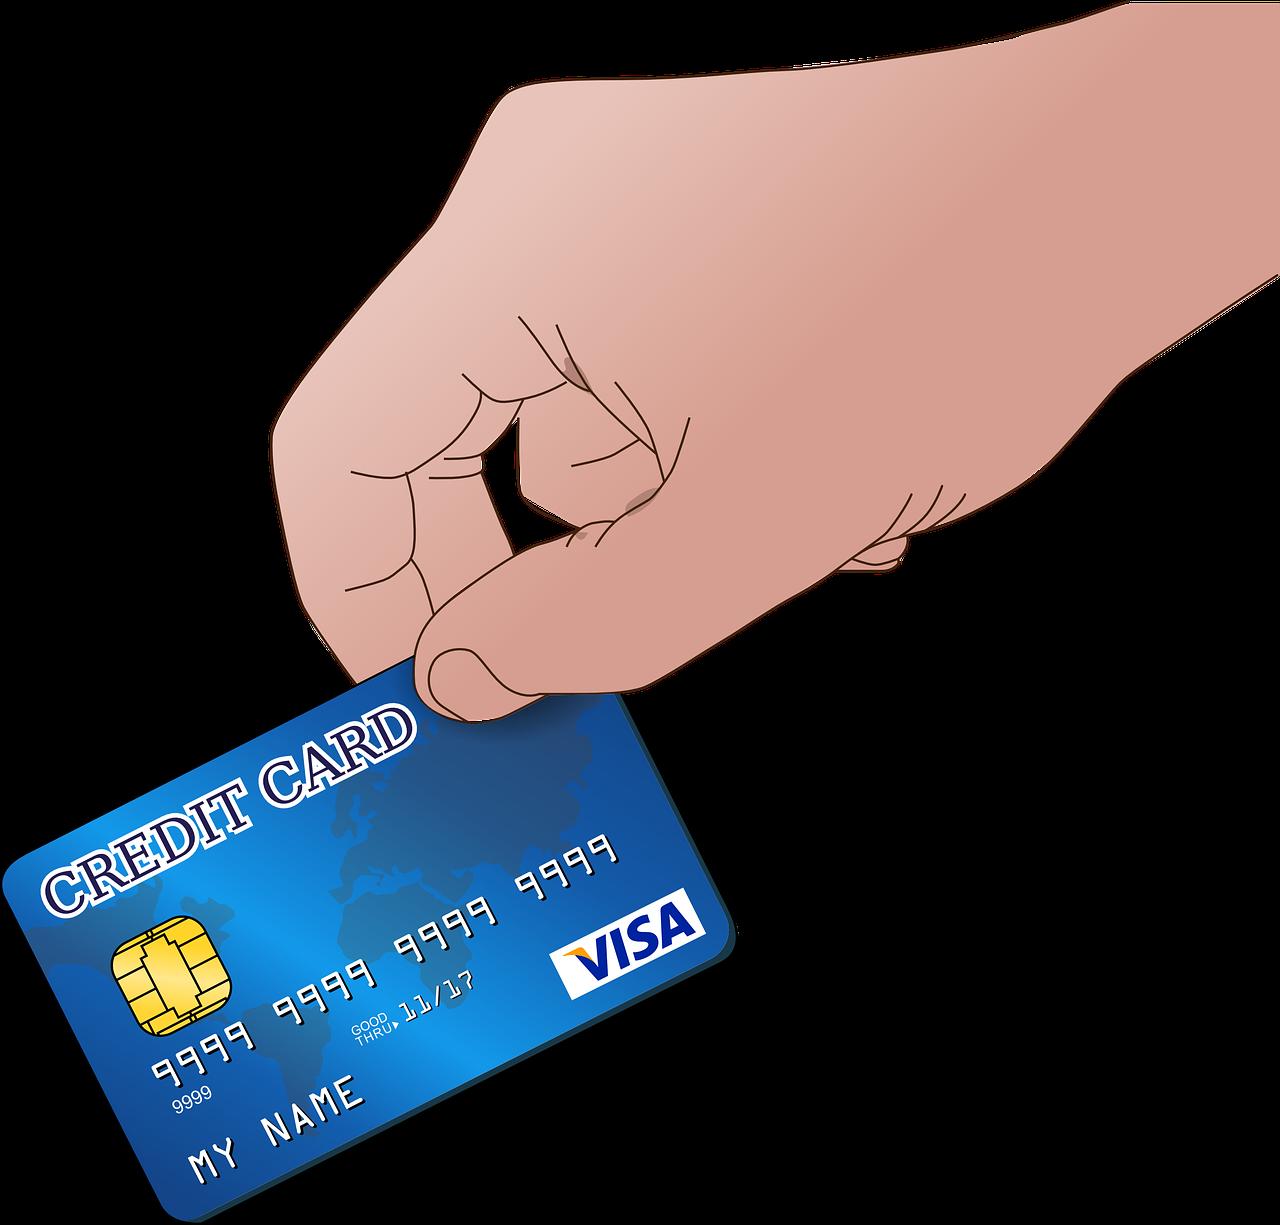 При получении или предоплата.Нал/безнал, карта, счет на оплату.